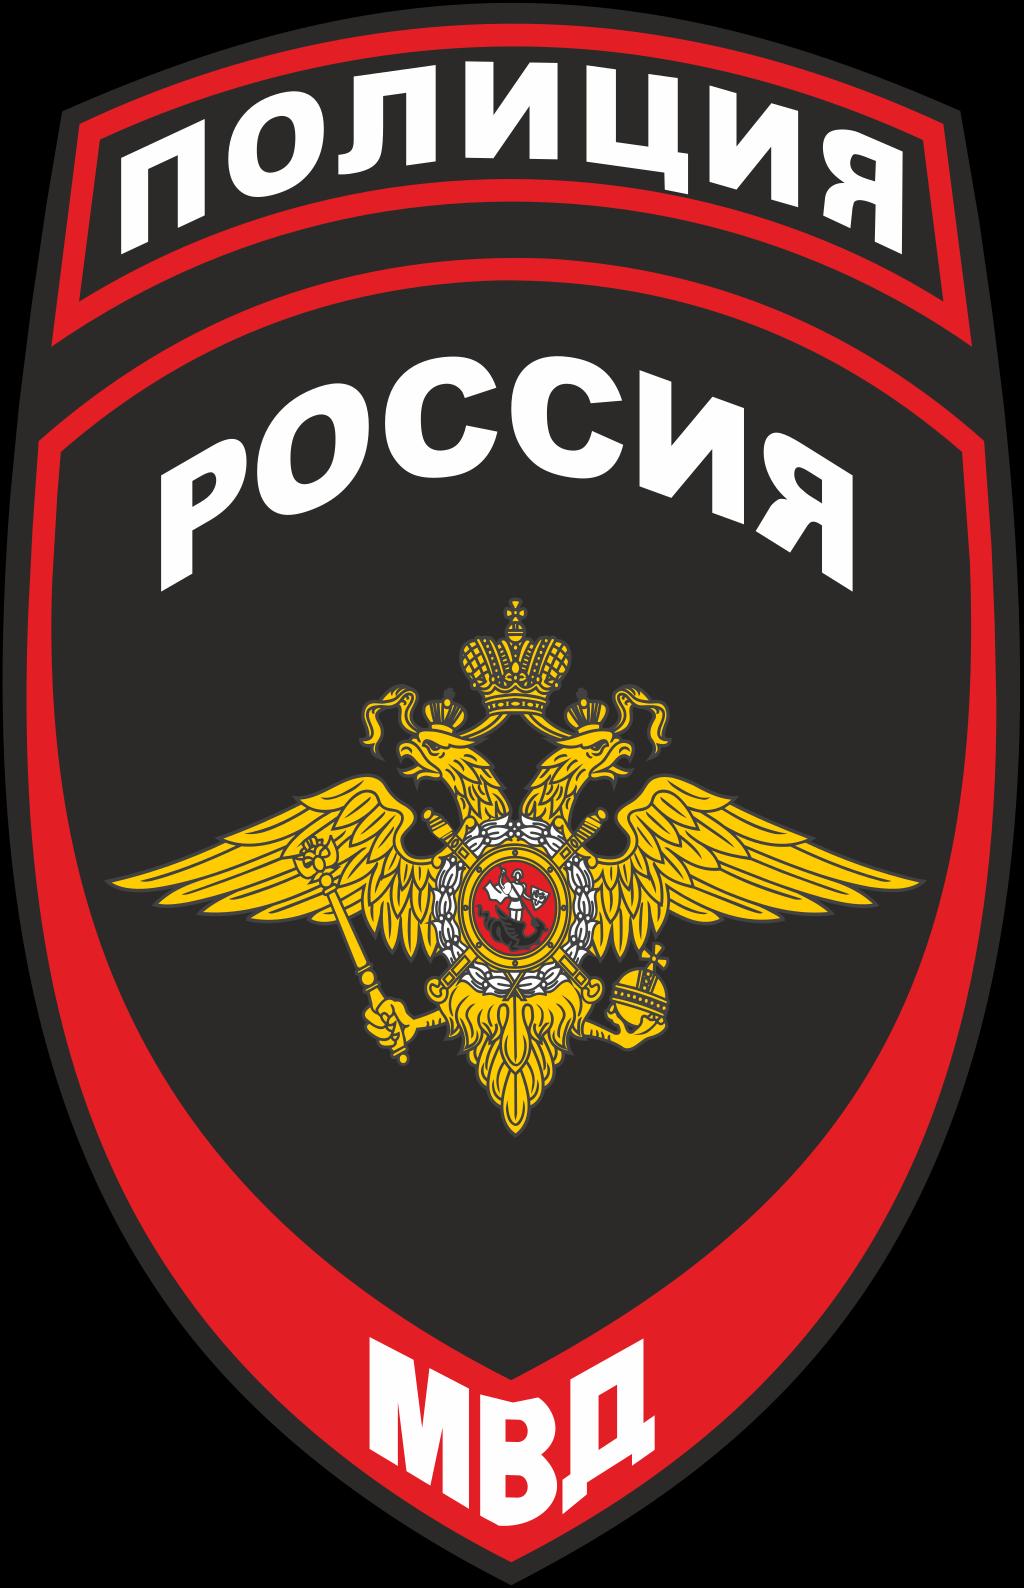 policepatch.png.eada9ebc6ffe17b3d26da215488c3b4d.png